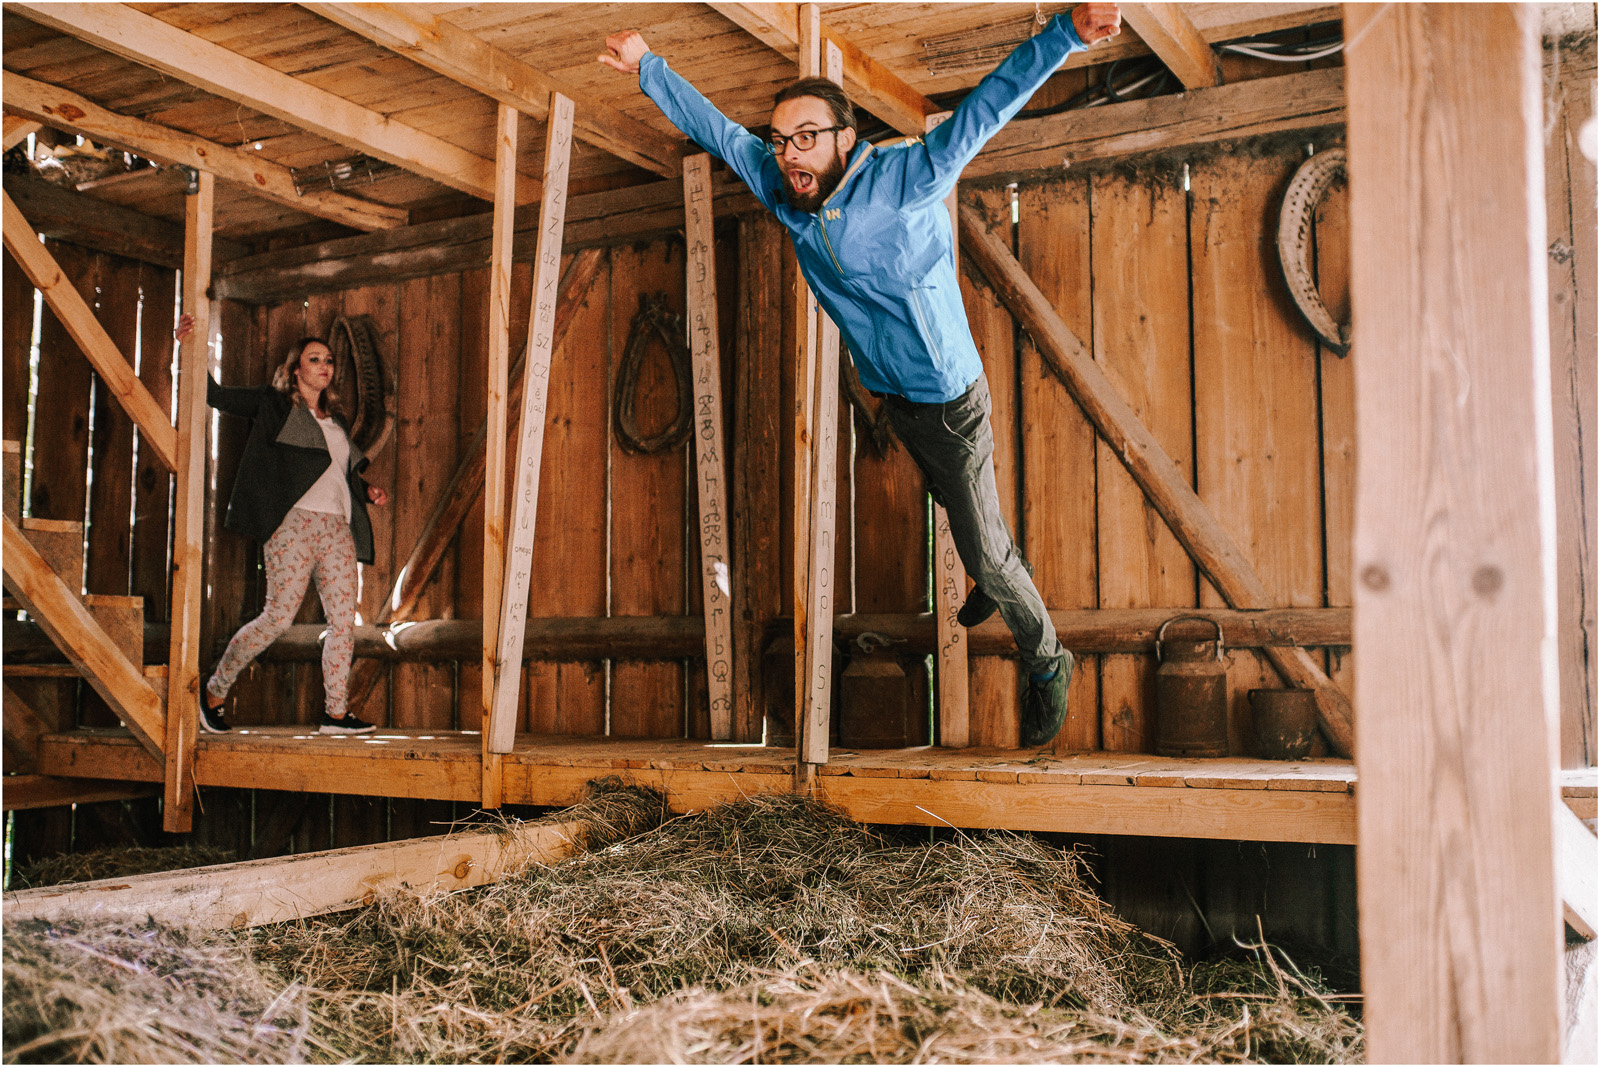 Agatka & Mati | garden party i impreza w stodole 45